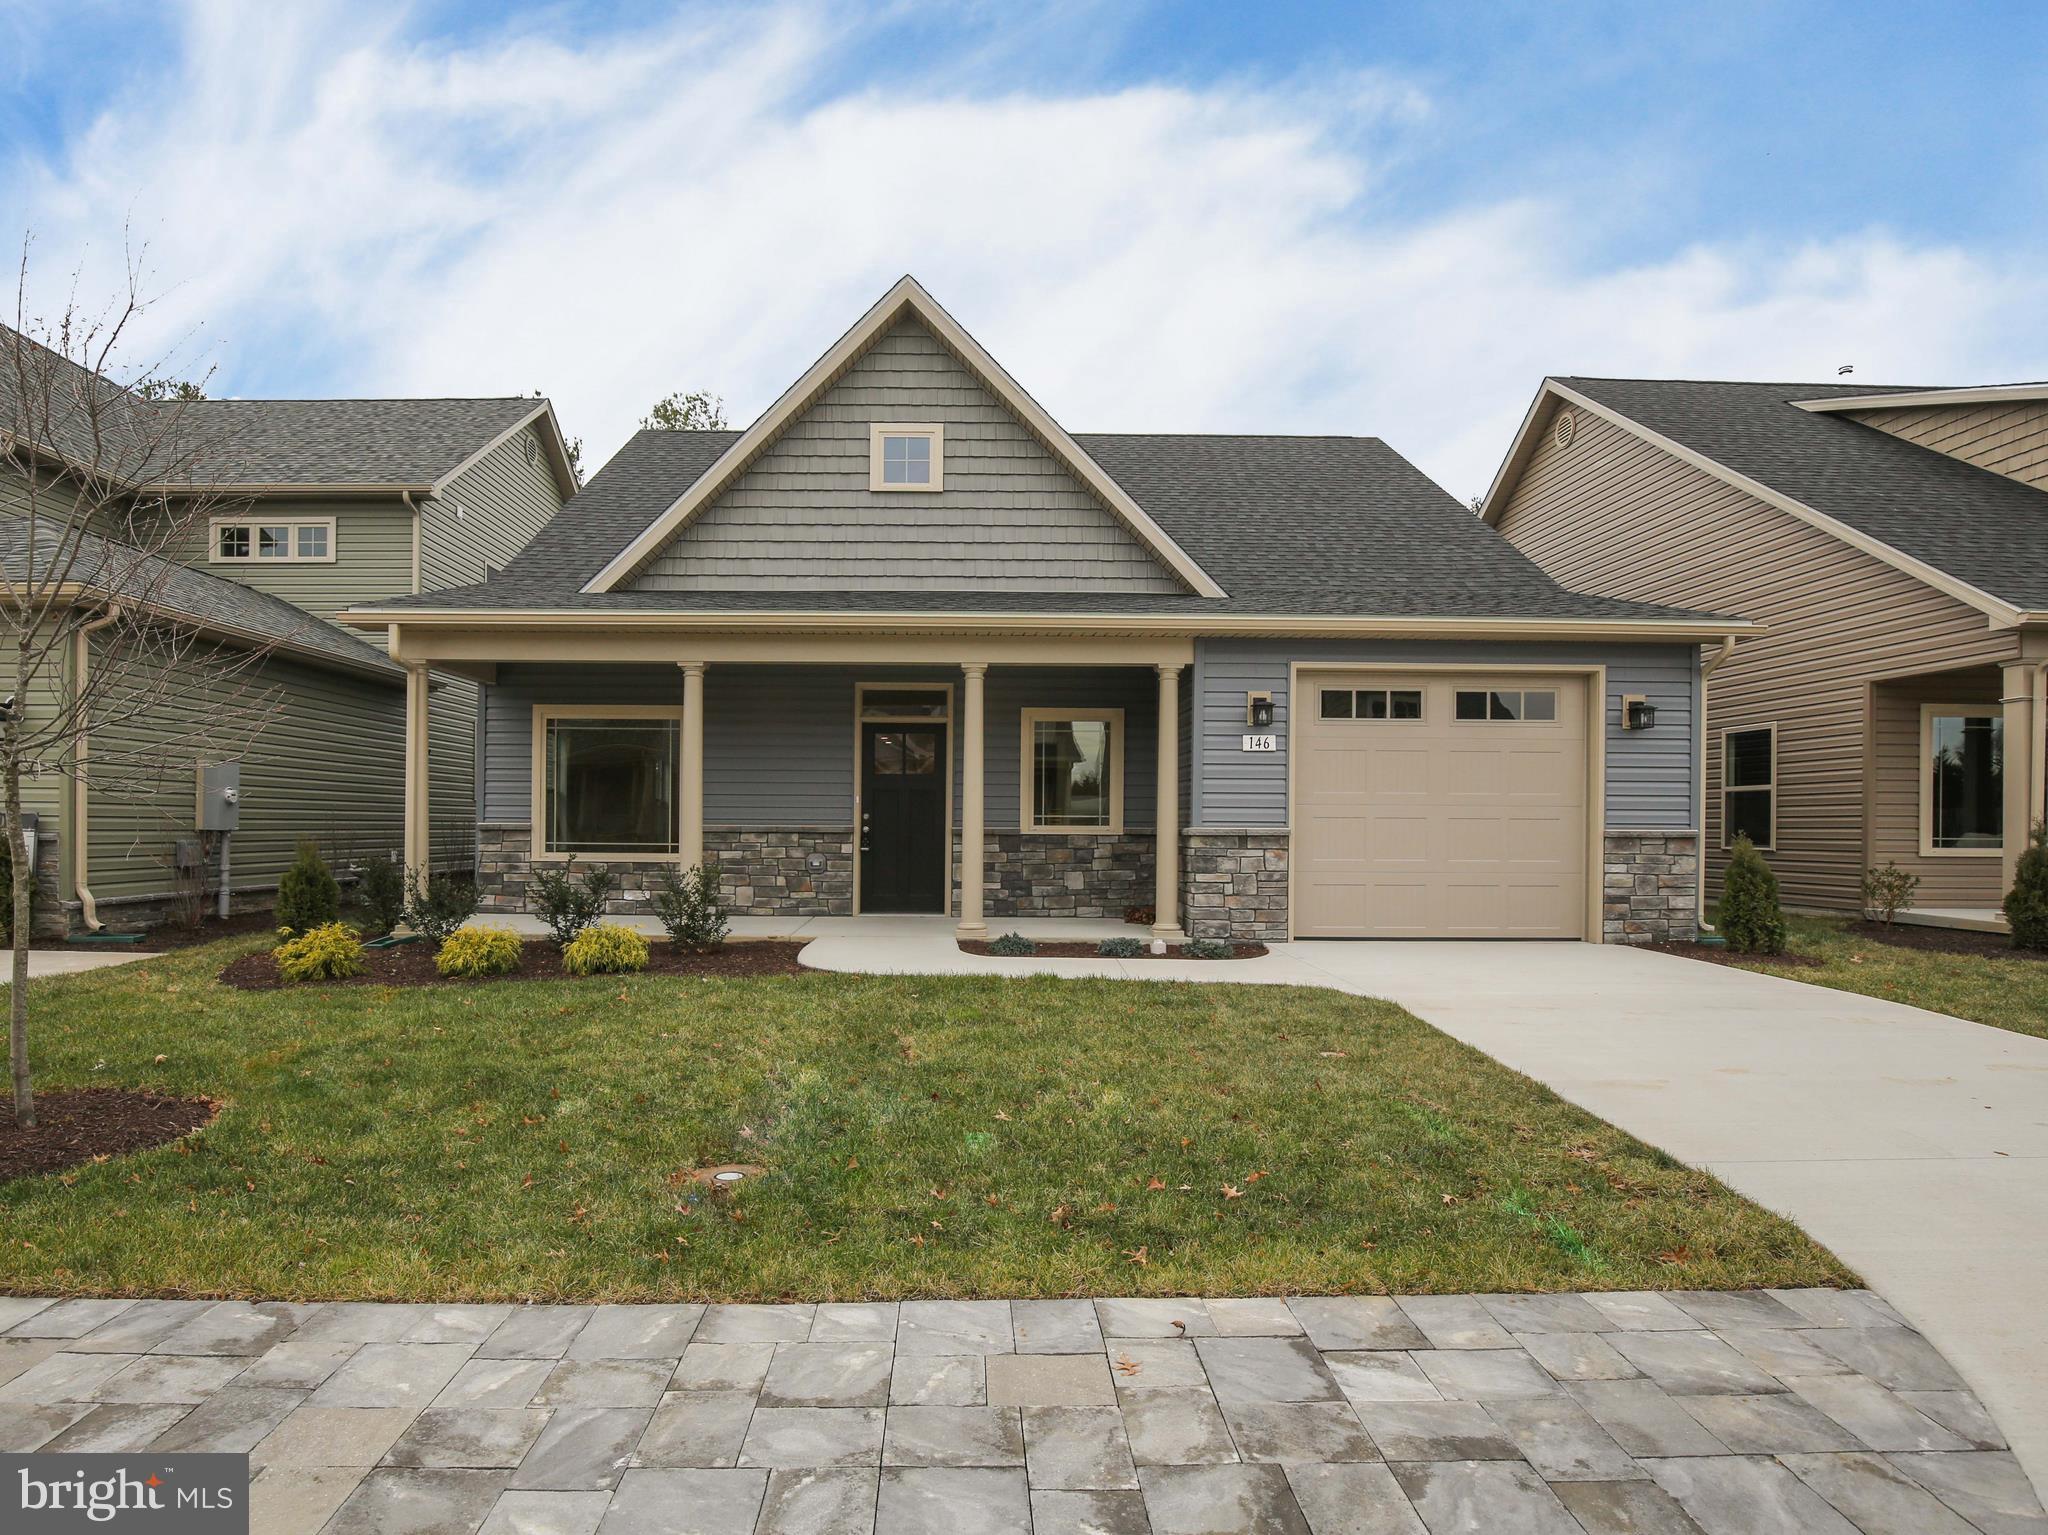 146 DOONBEG, Winchester, VA, 22602